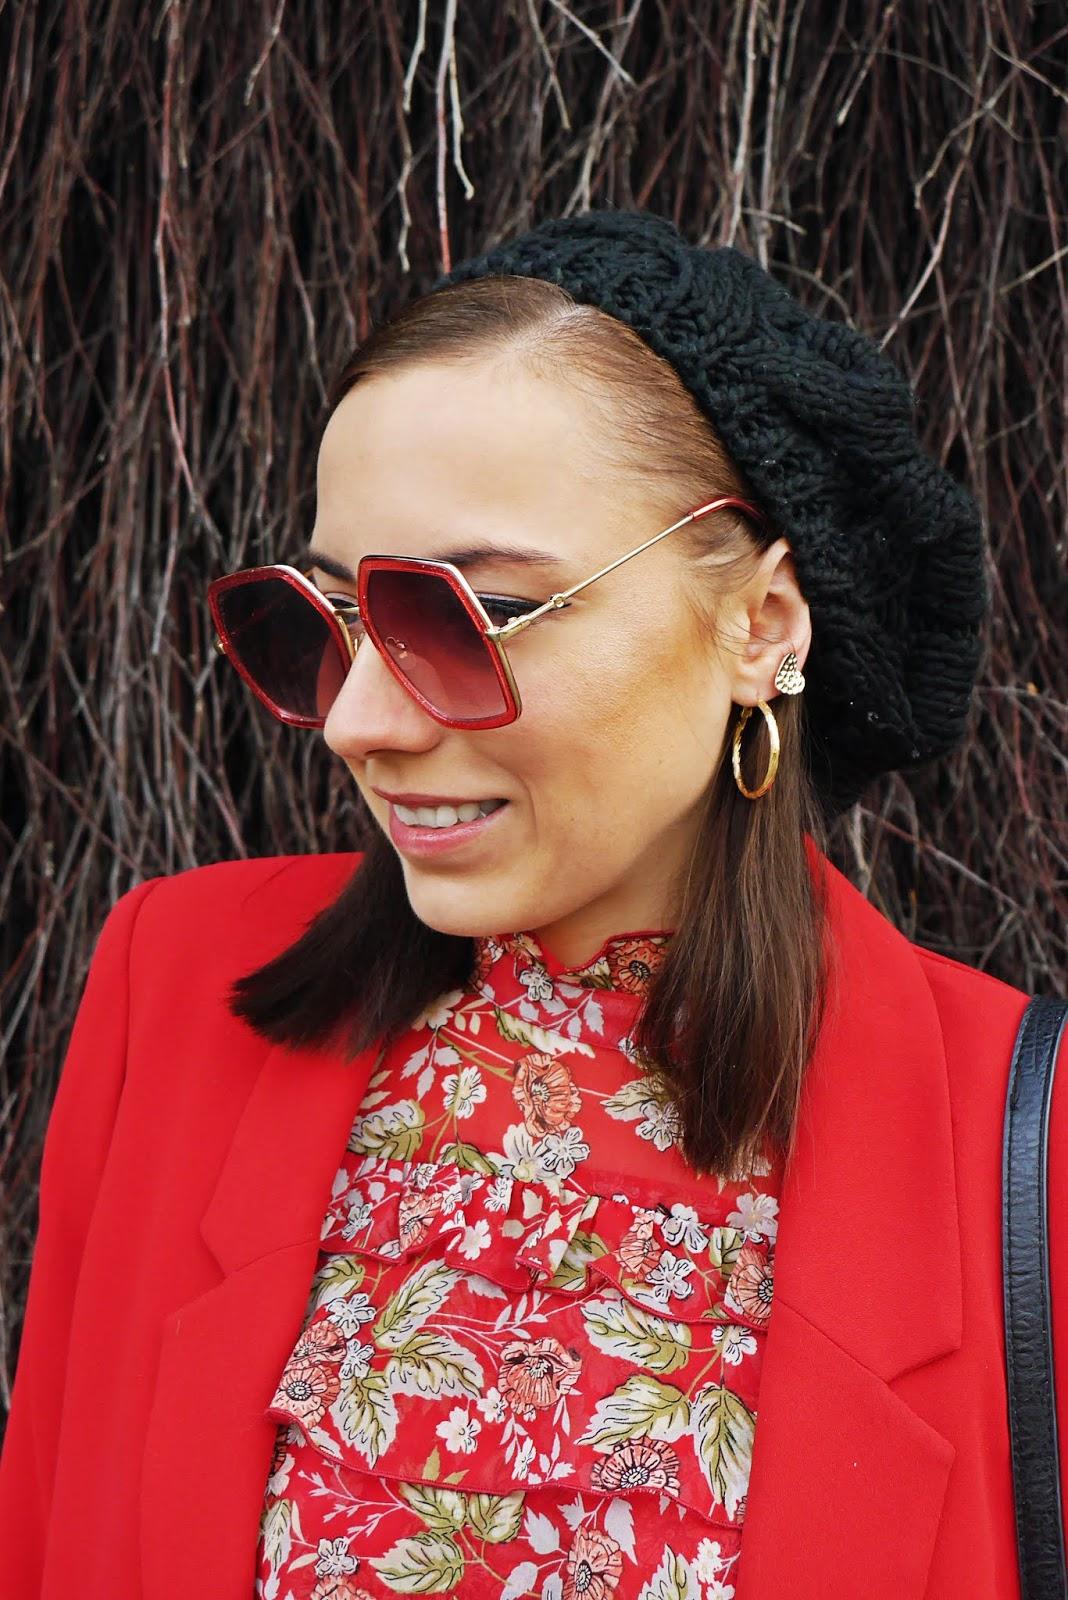 floral dress bonprix red jacket black high knee boots renee karyn fashion blogger